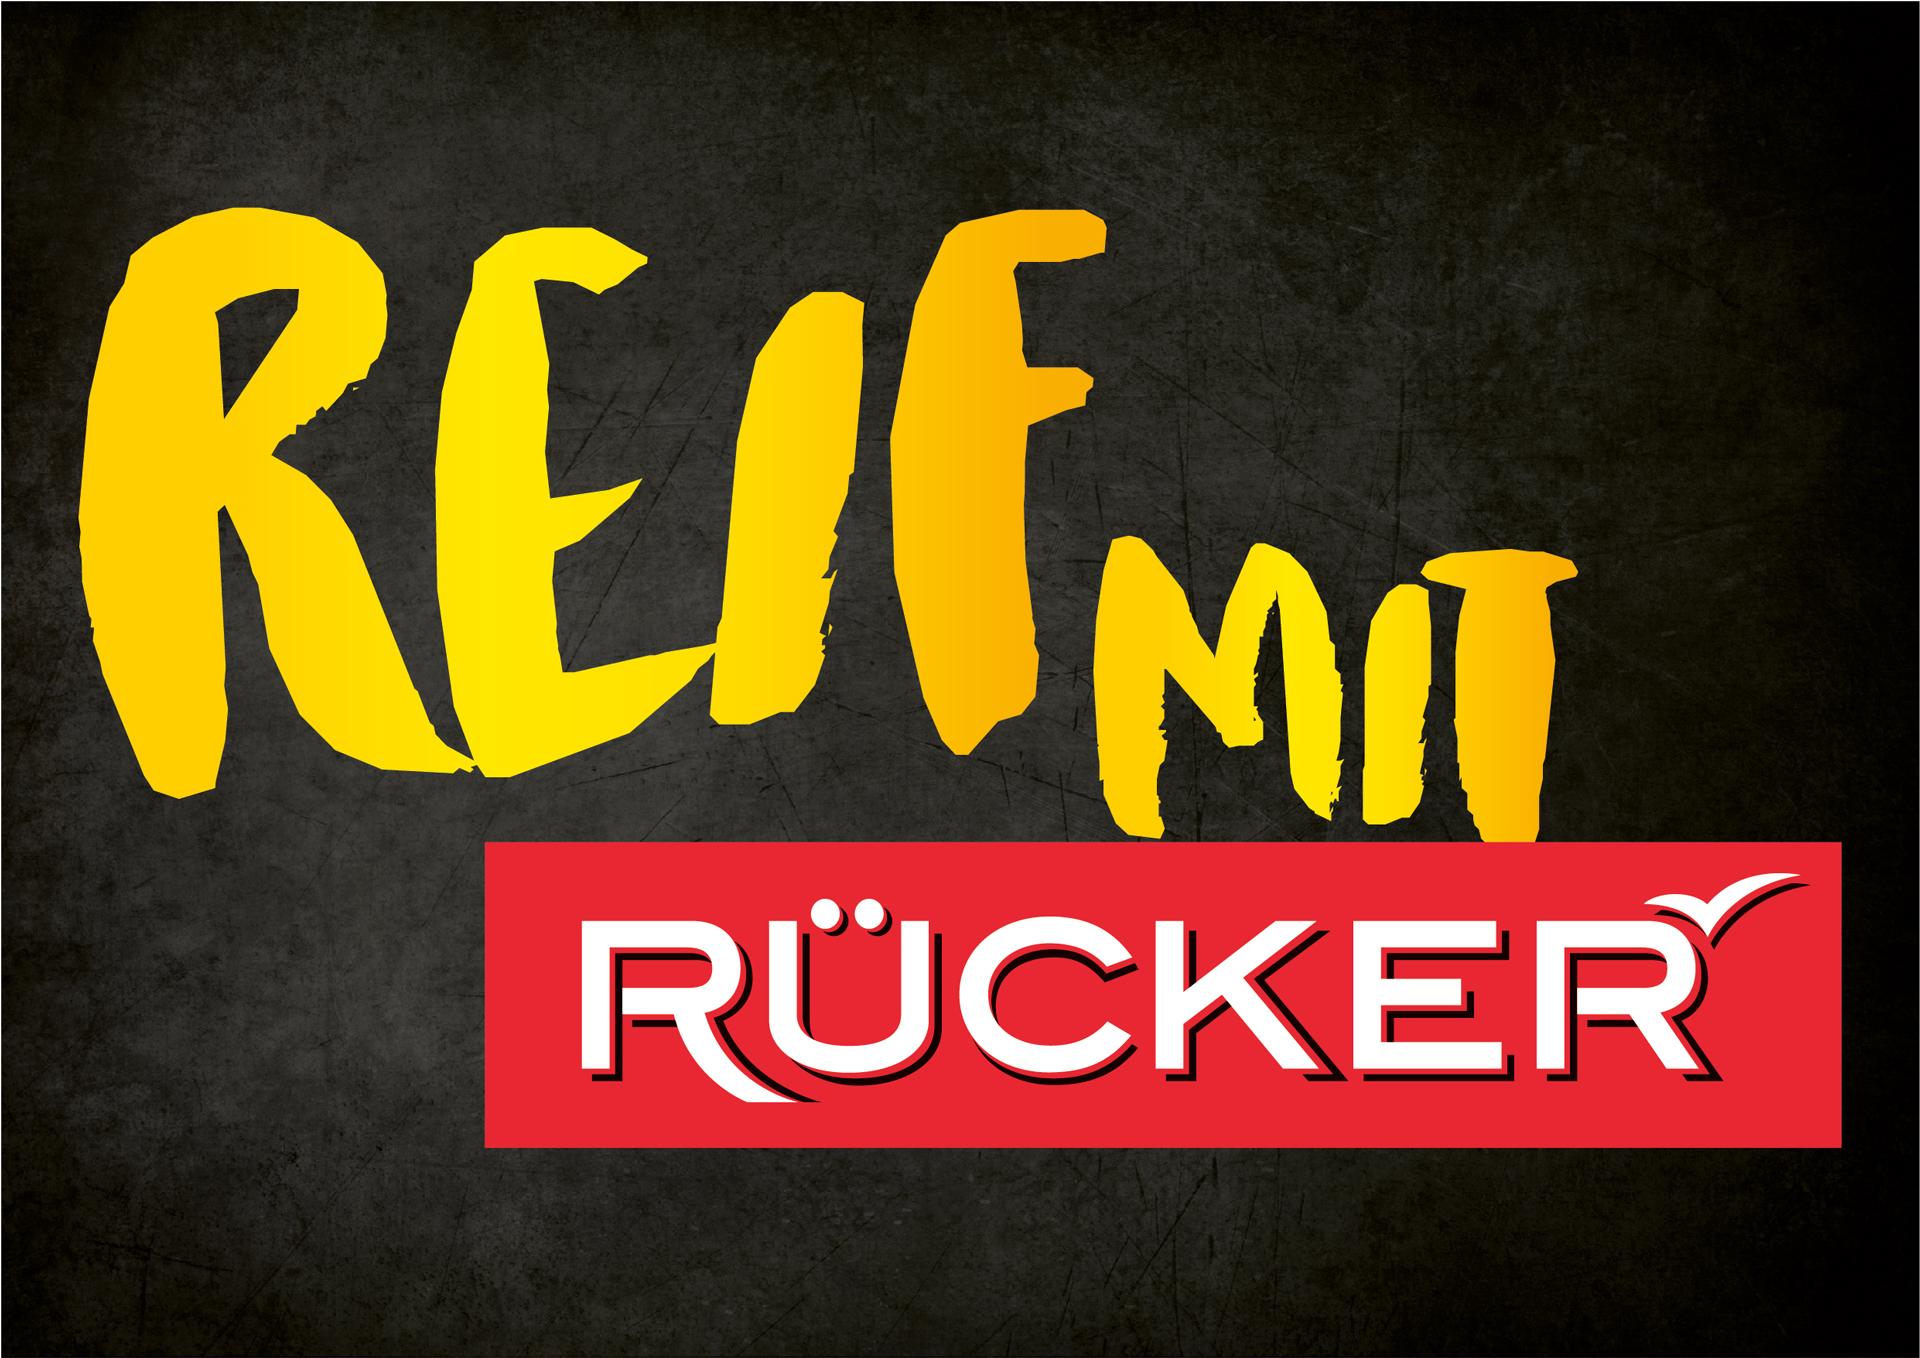 RUE_ReifmitRu?cker_Logo_schwarz.jpg – Molkerei Rücker GmbH